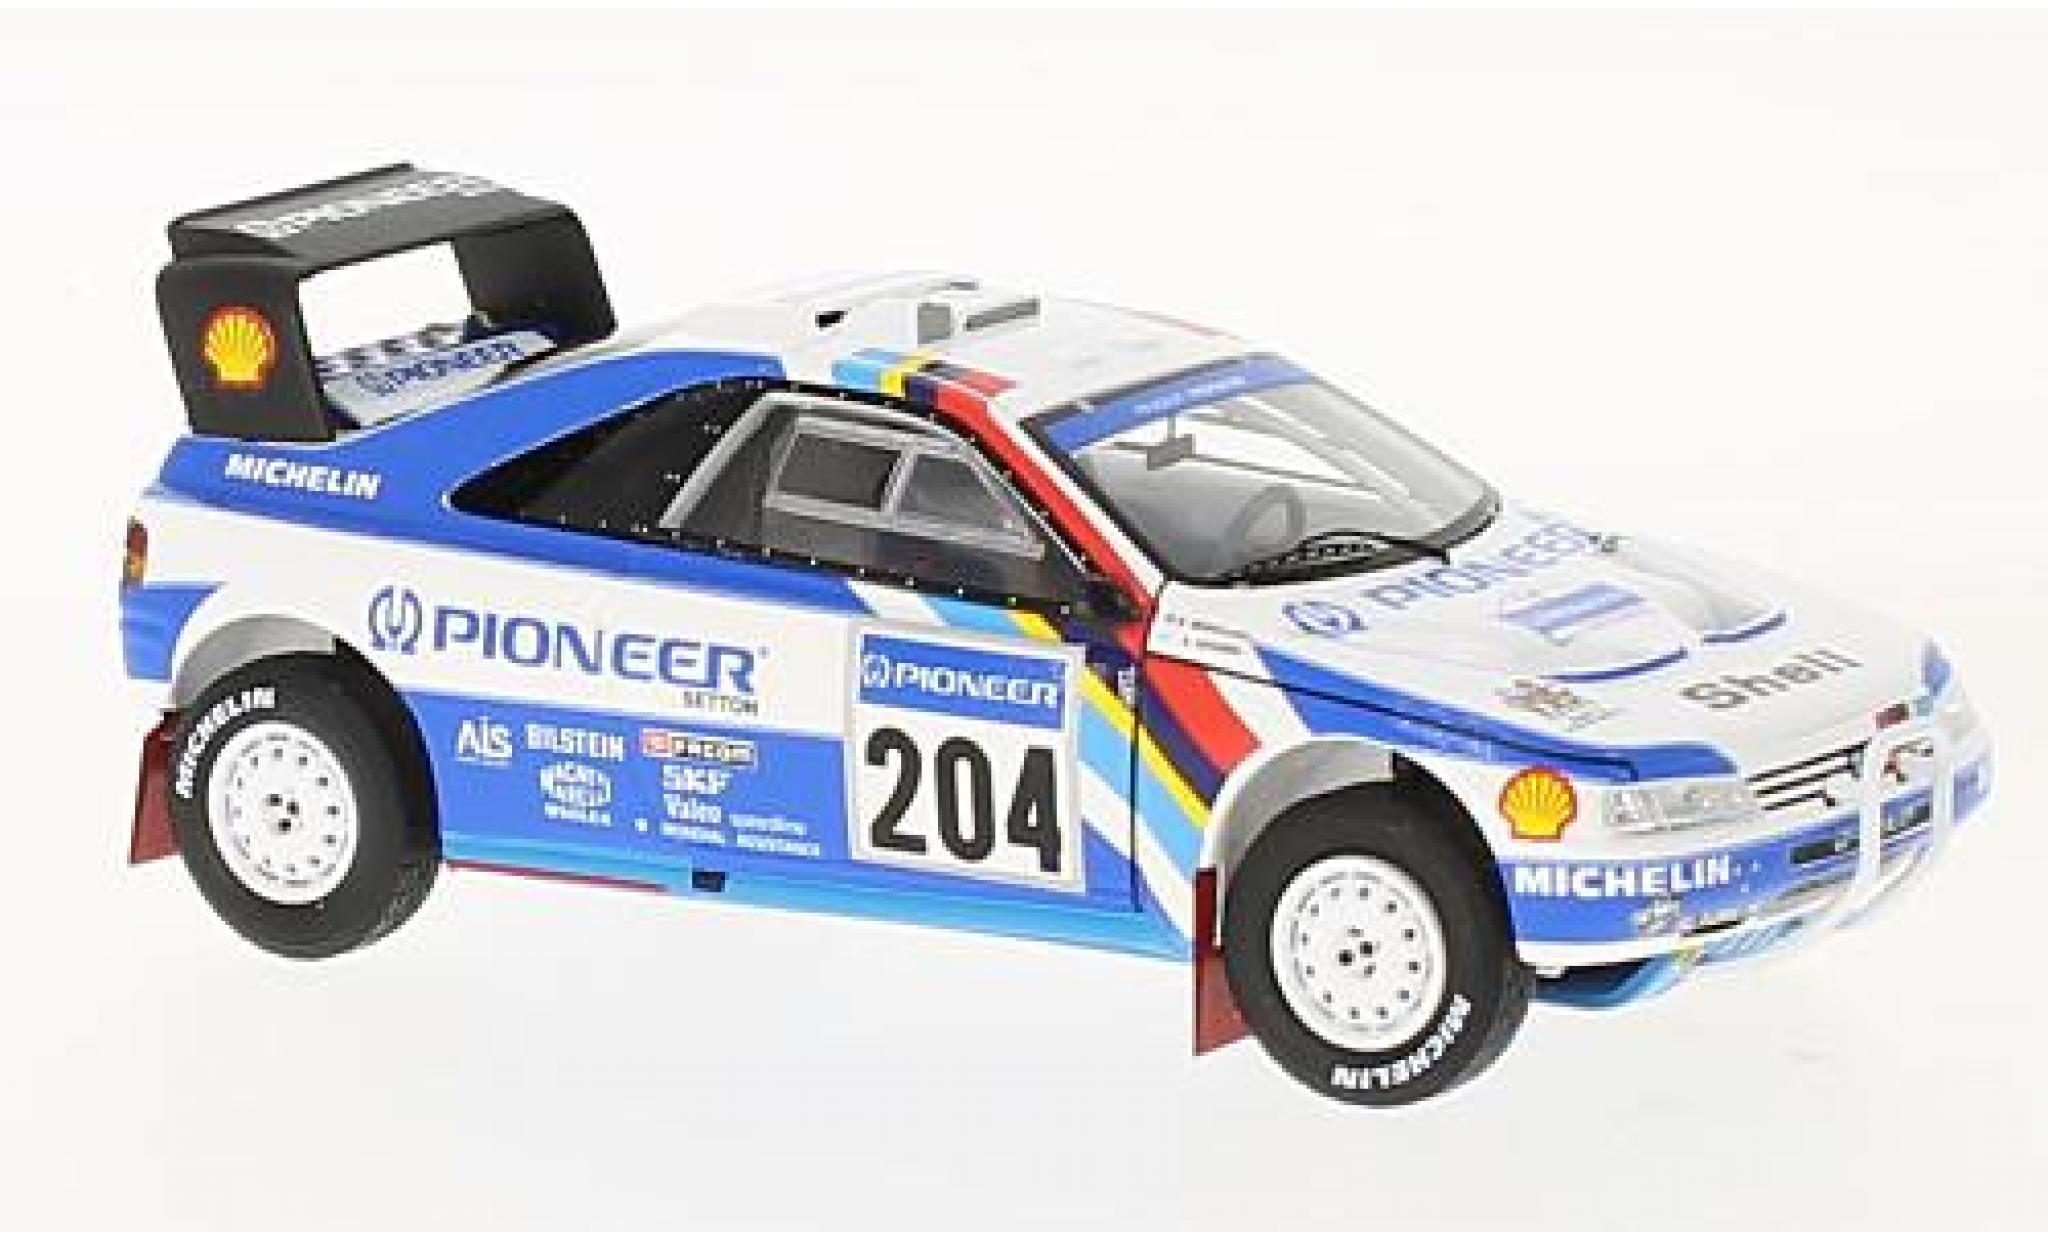 Peugeot 405 1/43 Spark T16 Grand Raid No.204 Pioneer Rallye Dakar Paris 1989 A.Vatanen/B.Berglund